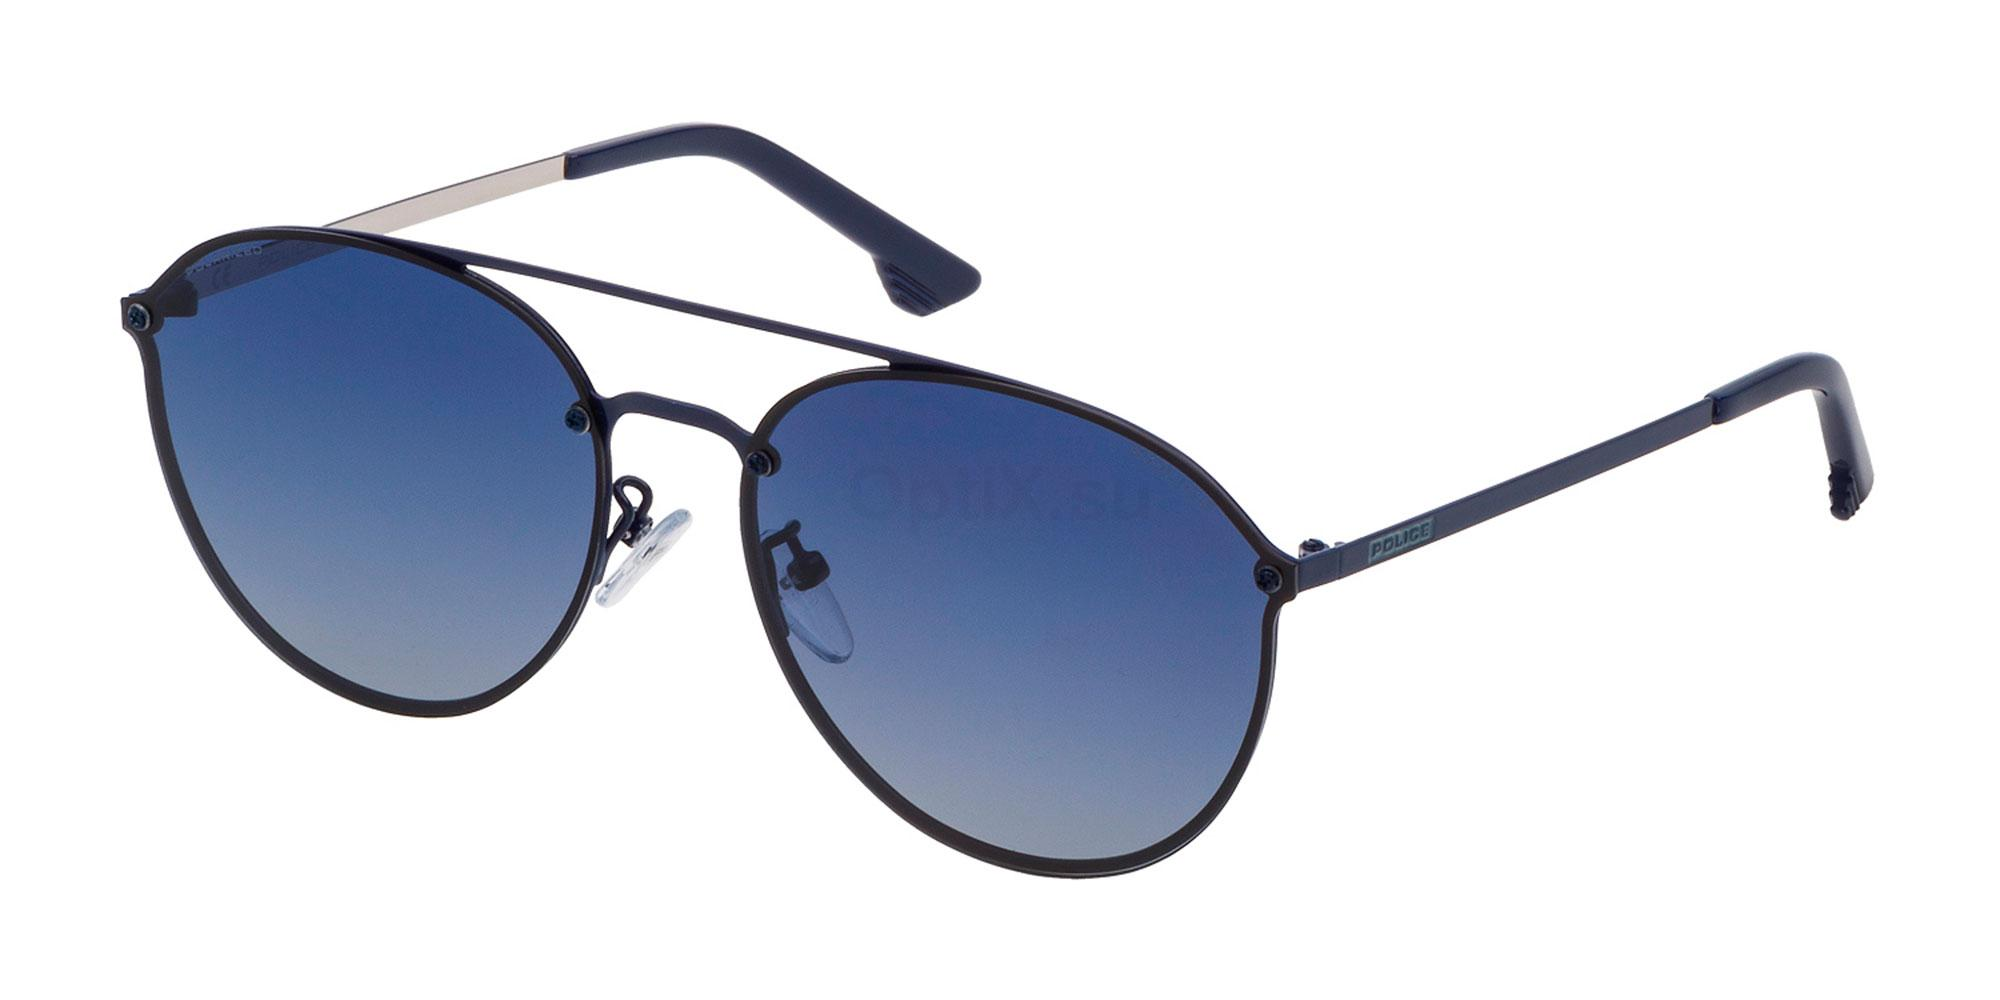 0L71 SK549 Sunglasses, Police Kids